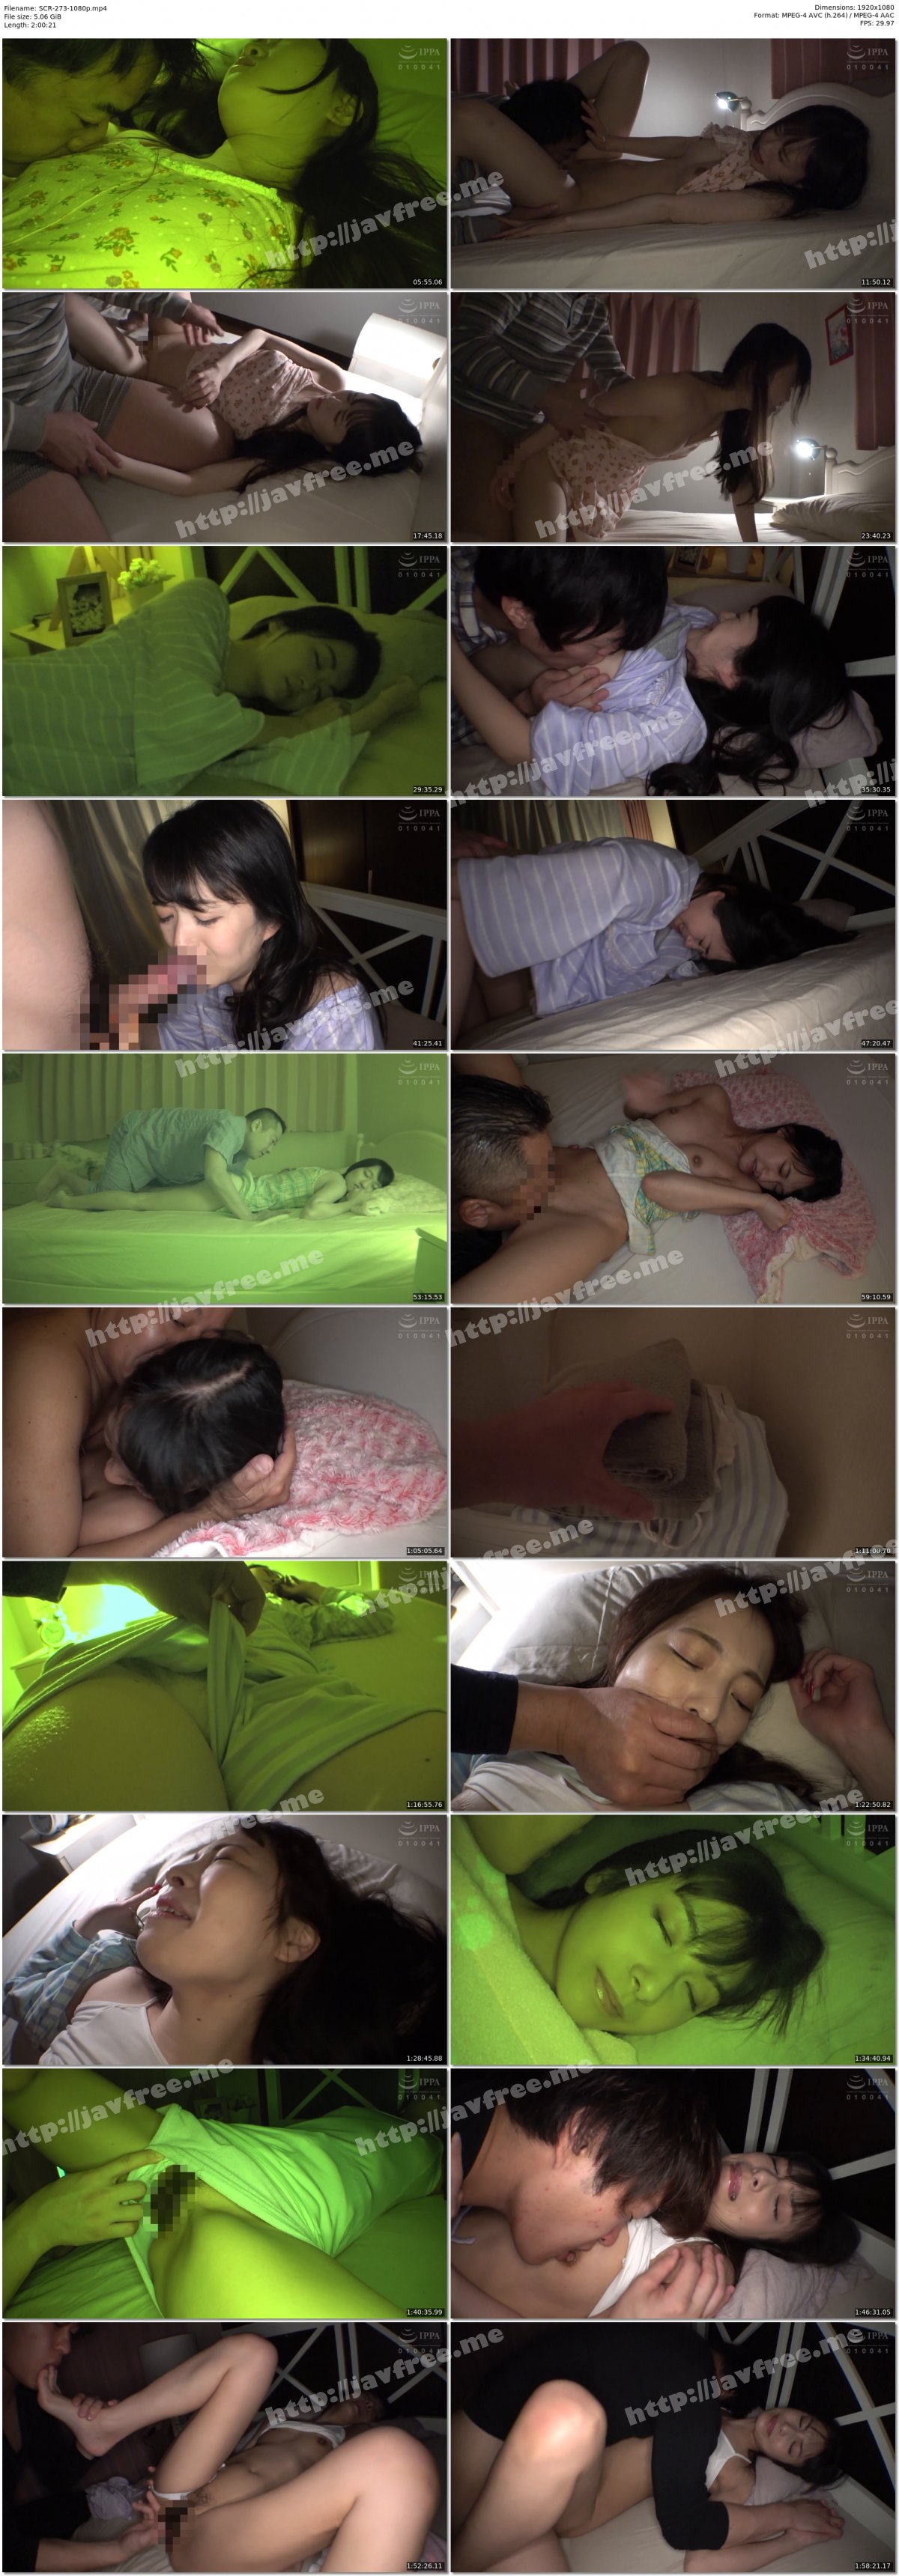 [HD][SCR-273] 寝込みを襲われ犯●れる姪っ子、母親、娘、妹、姉たち 家庭内夜●いレ●プ投稿映像 - image SCR-273-1080p on https://javfree.me